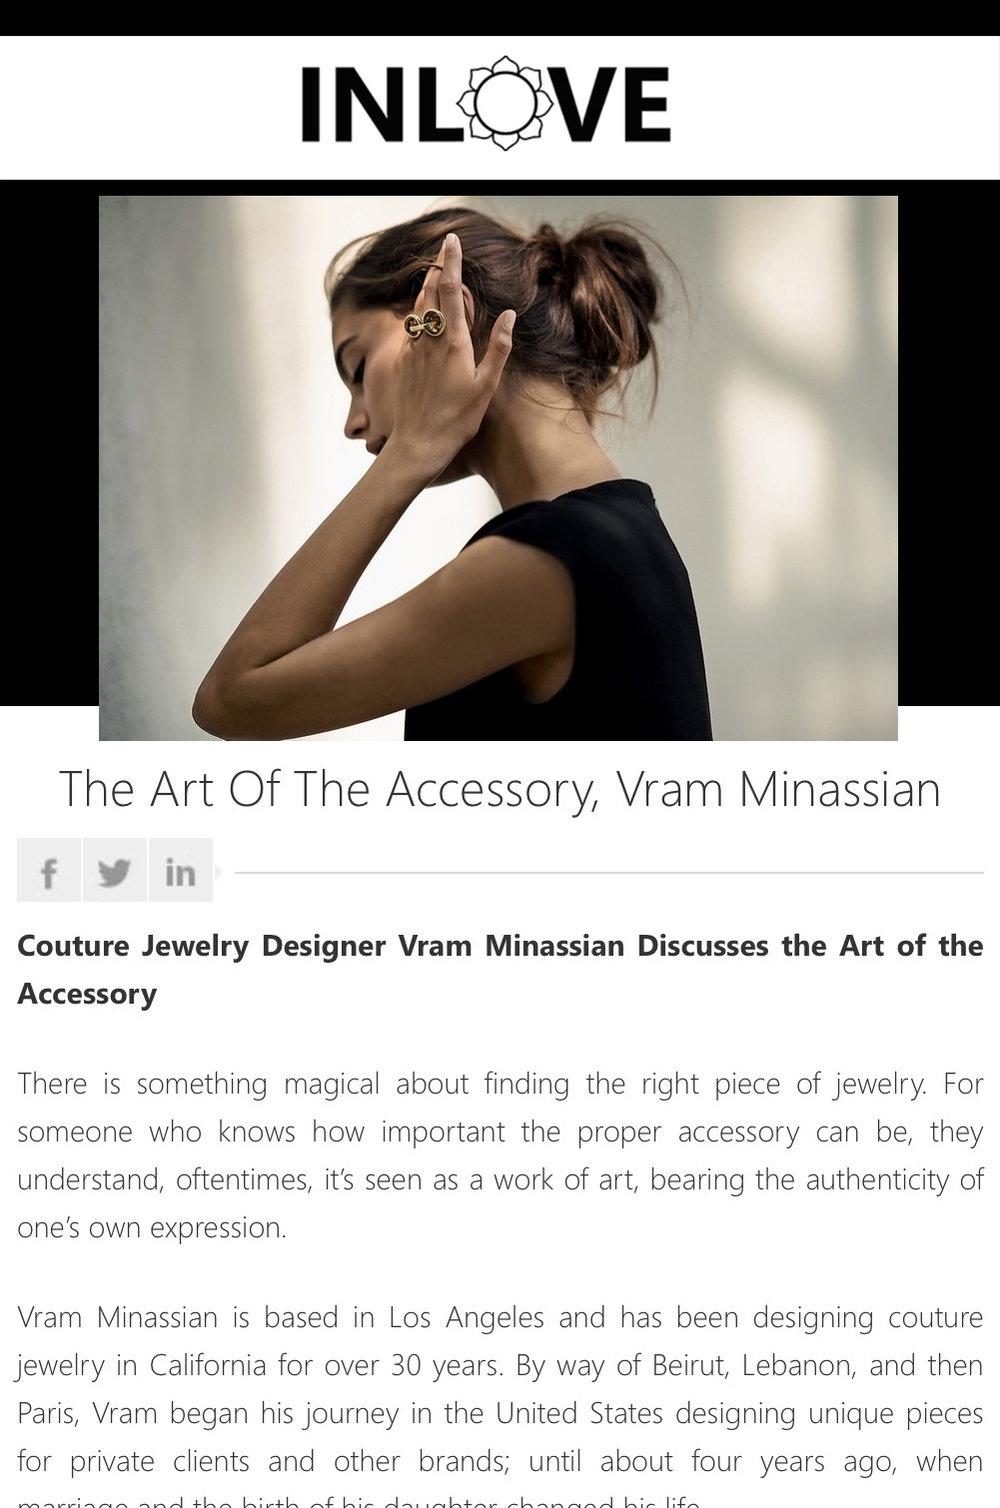 VRAM Jewelry INLOVE Magazine